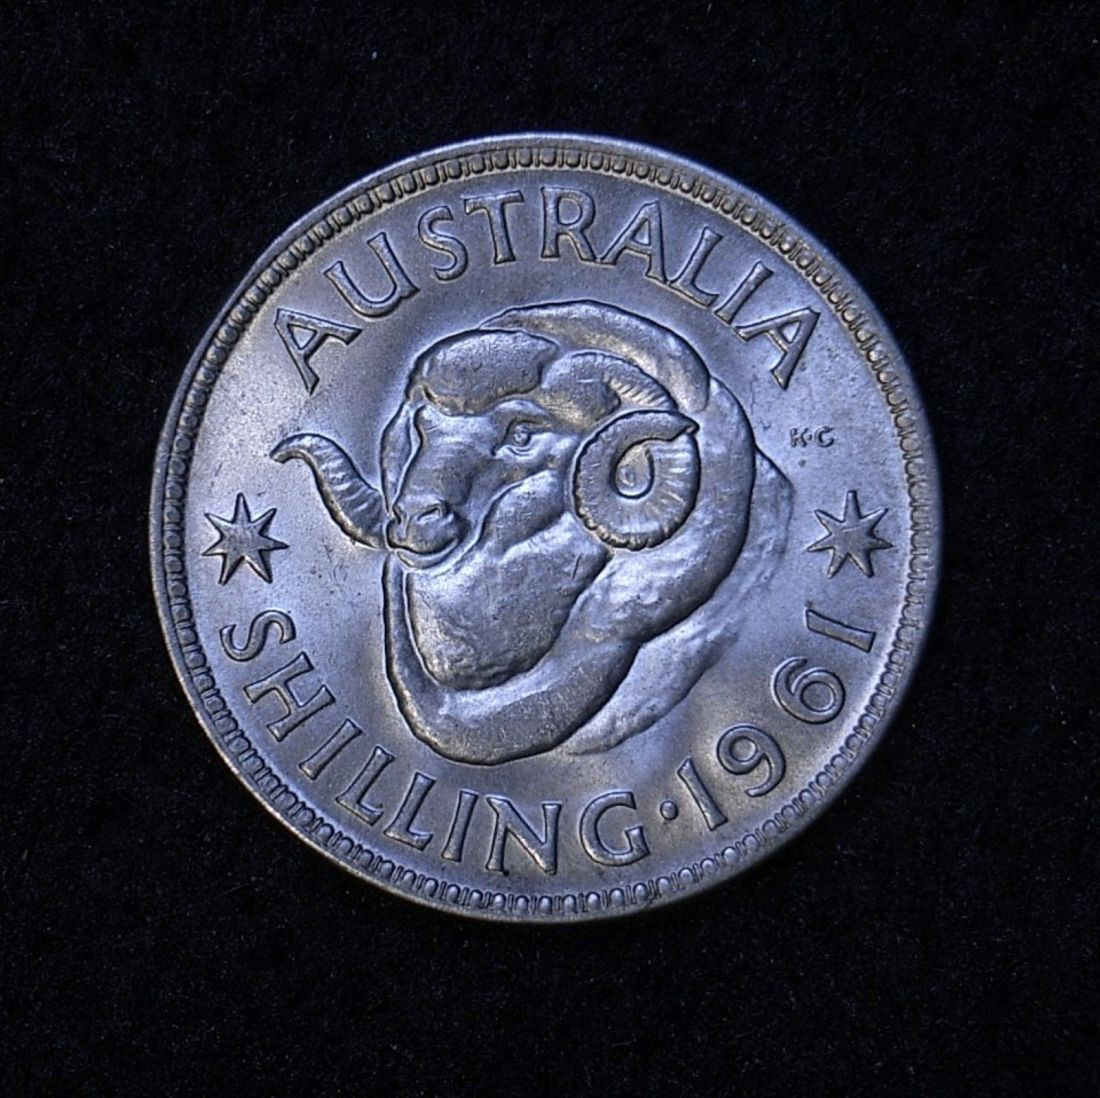 Close up Aus Shilling 1961 reverse